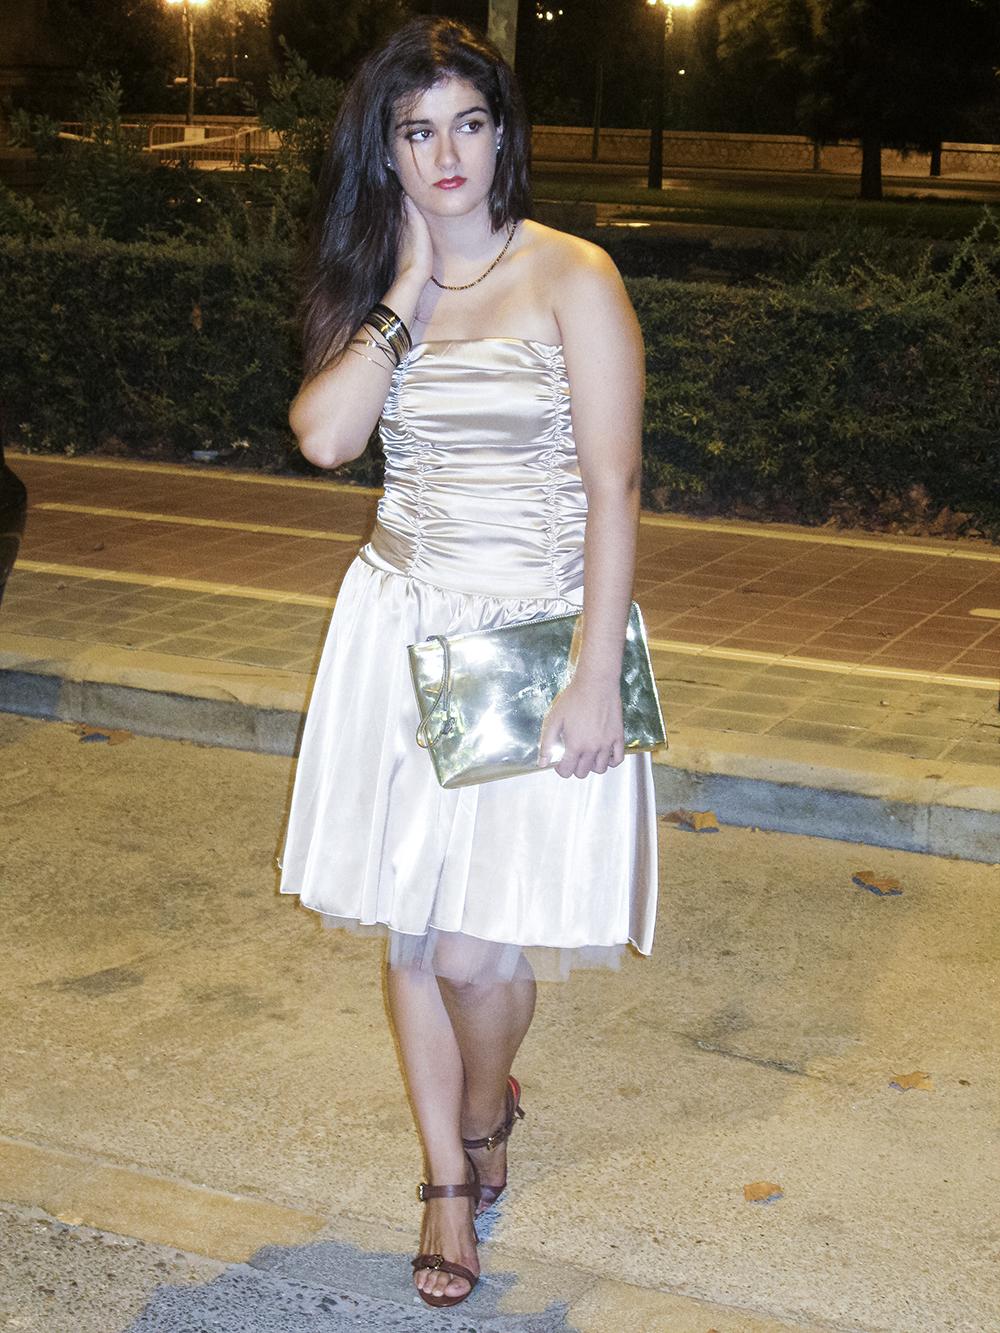 somethingfashion blogger valencia influencer spain_carolina herrera sandals_vintage dress beauty beast inspired 2